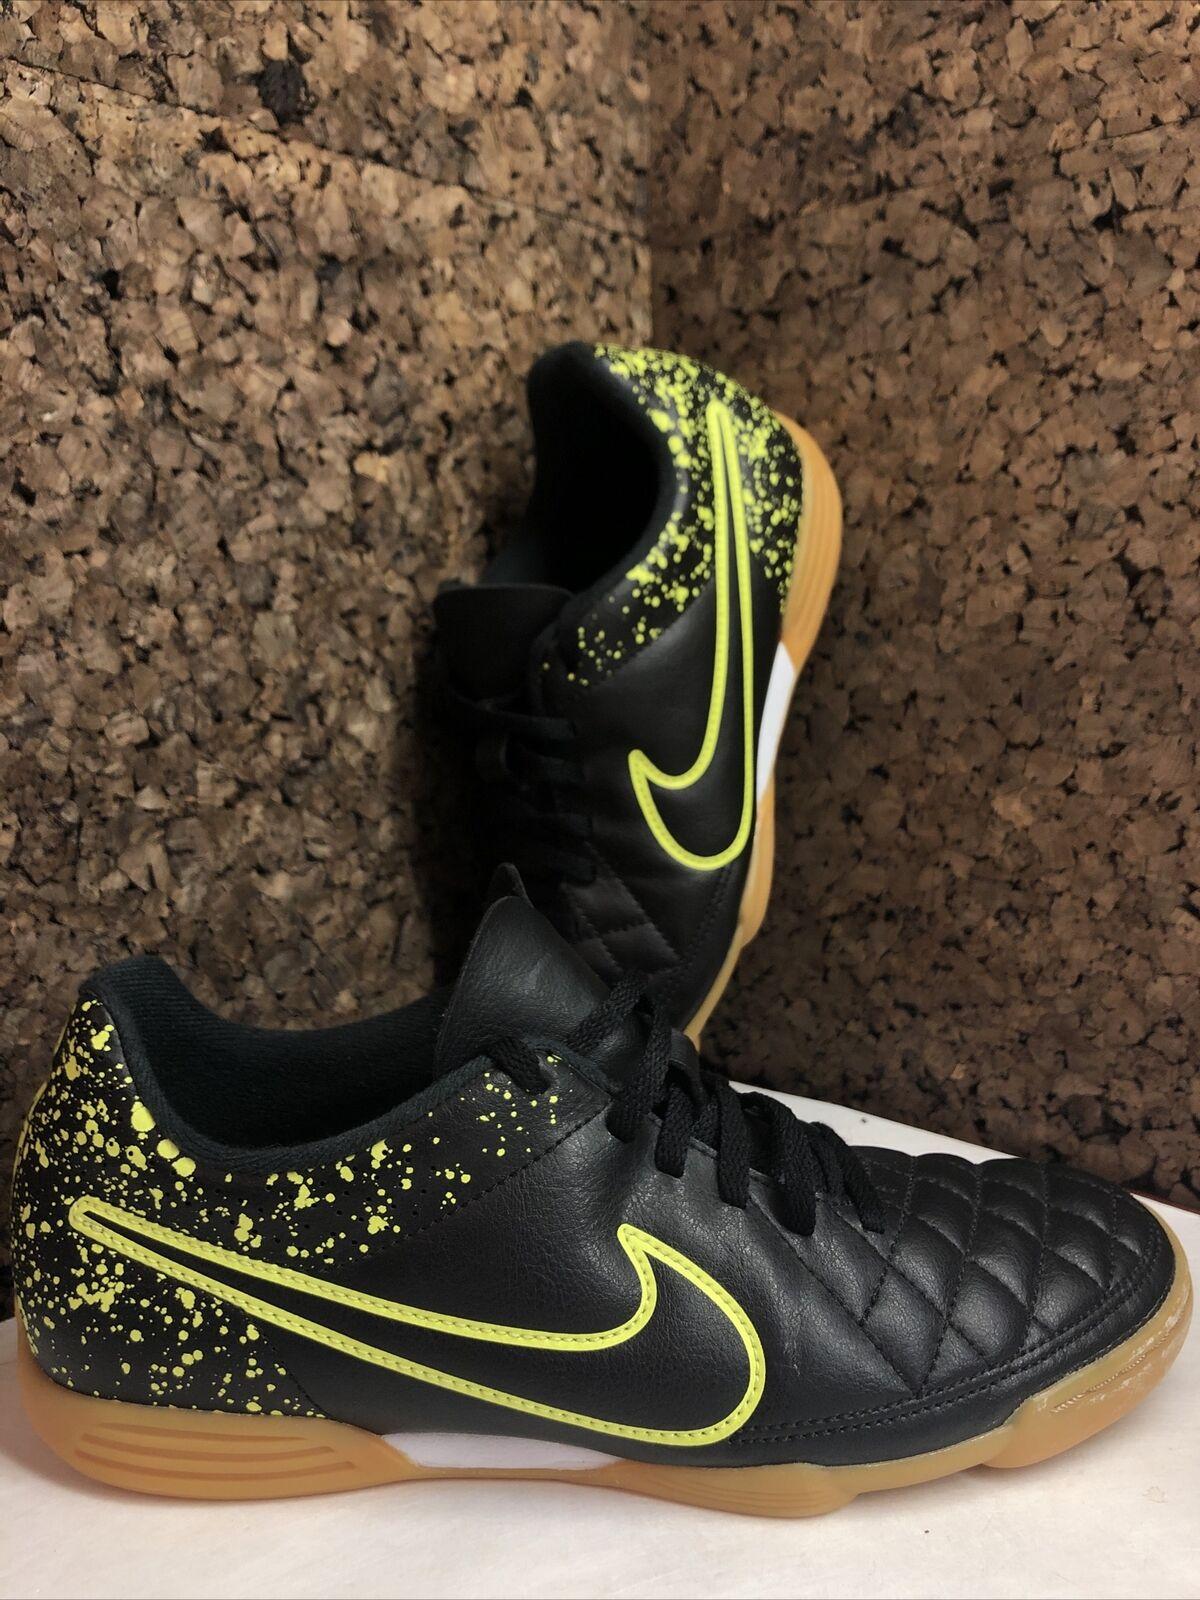 Nike Tiempo Rio II IC Black Volt Green Soccer Indoor Shoes US Sz ...